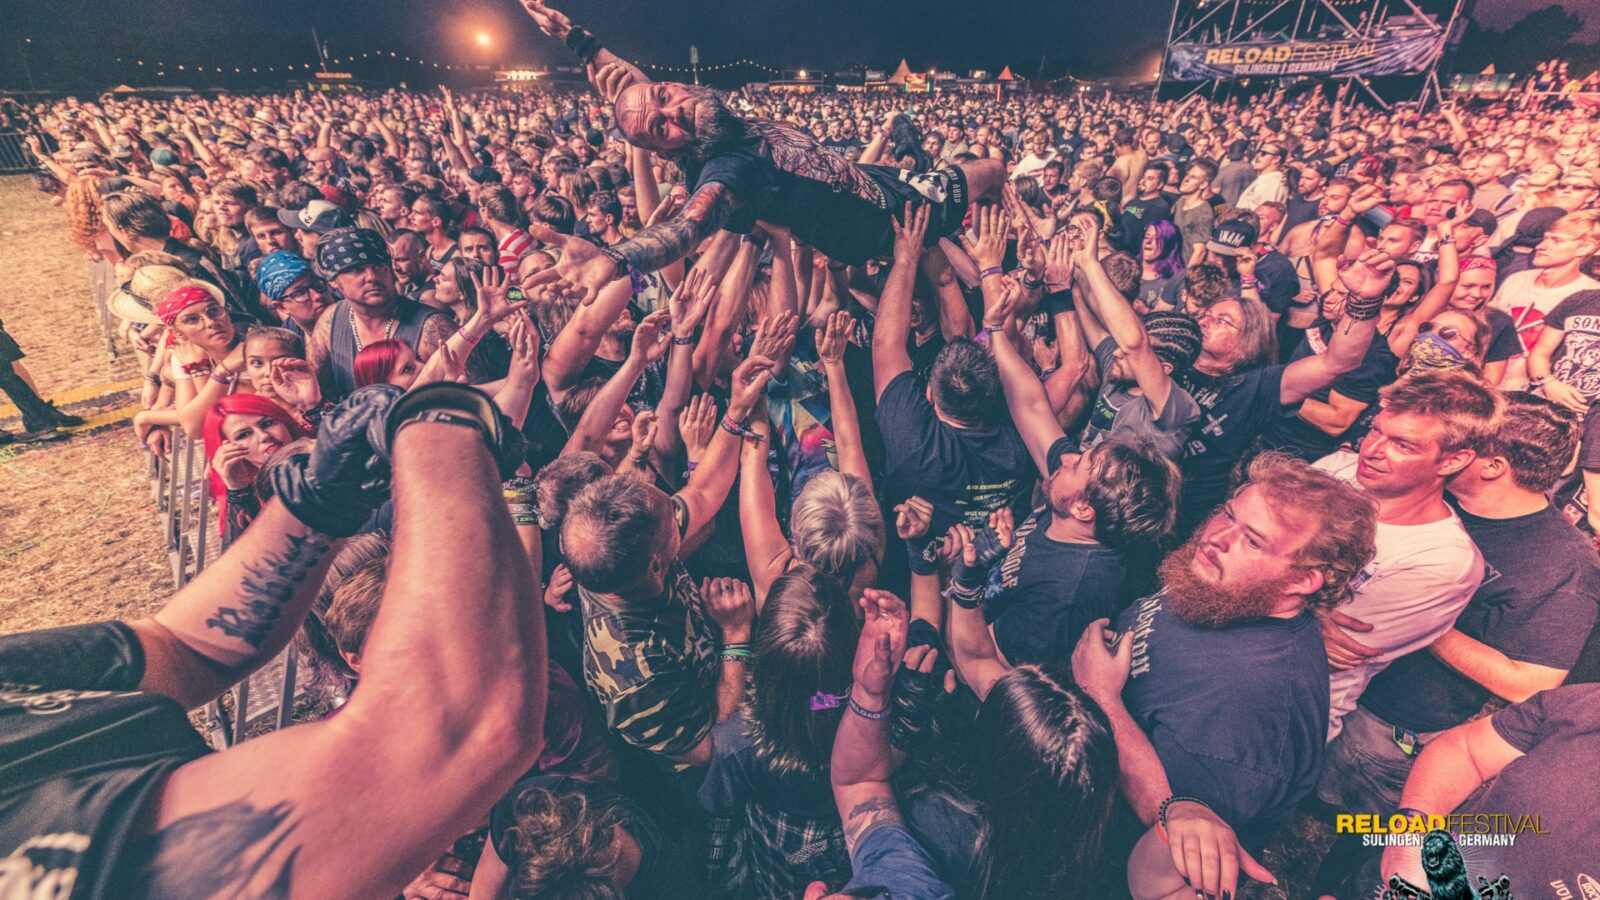 REVIEW: RELOAD FESTIVAL 2019